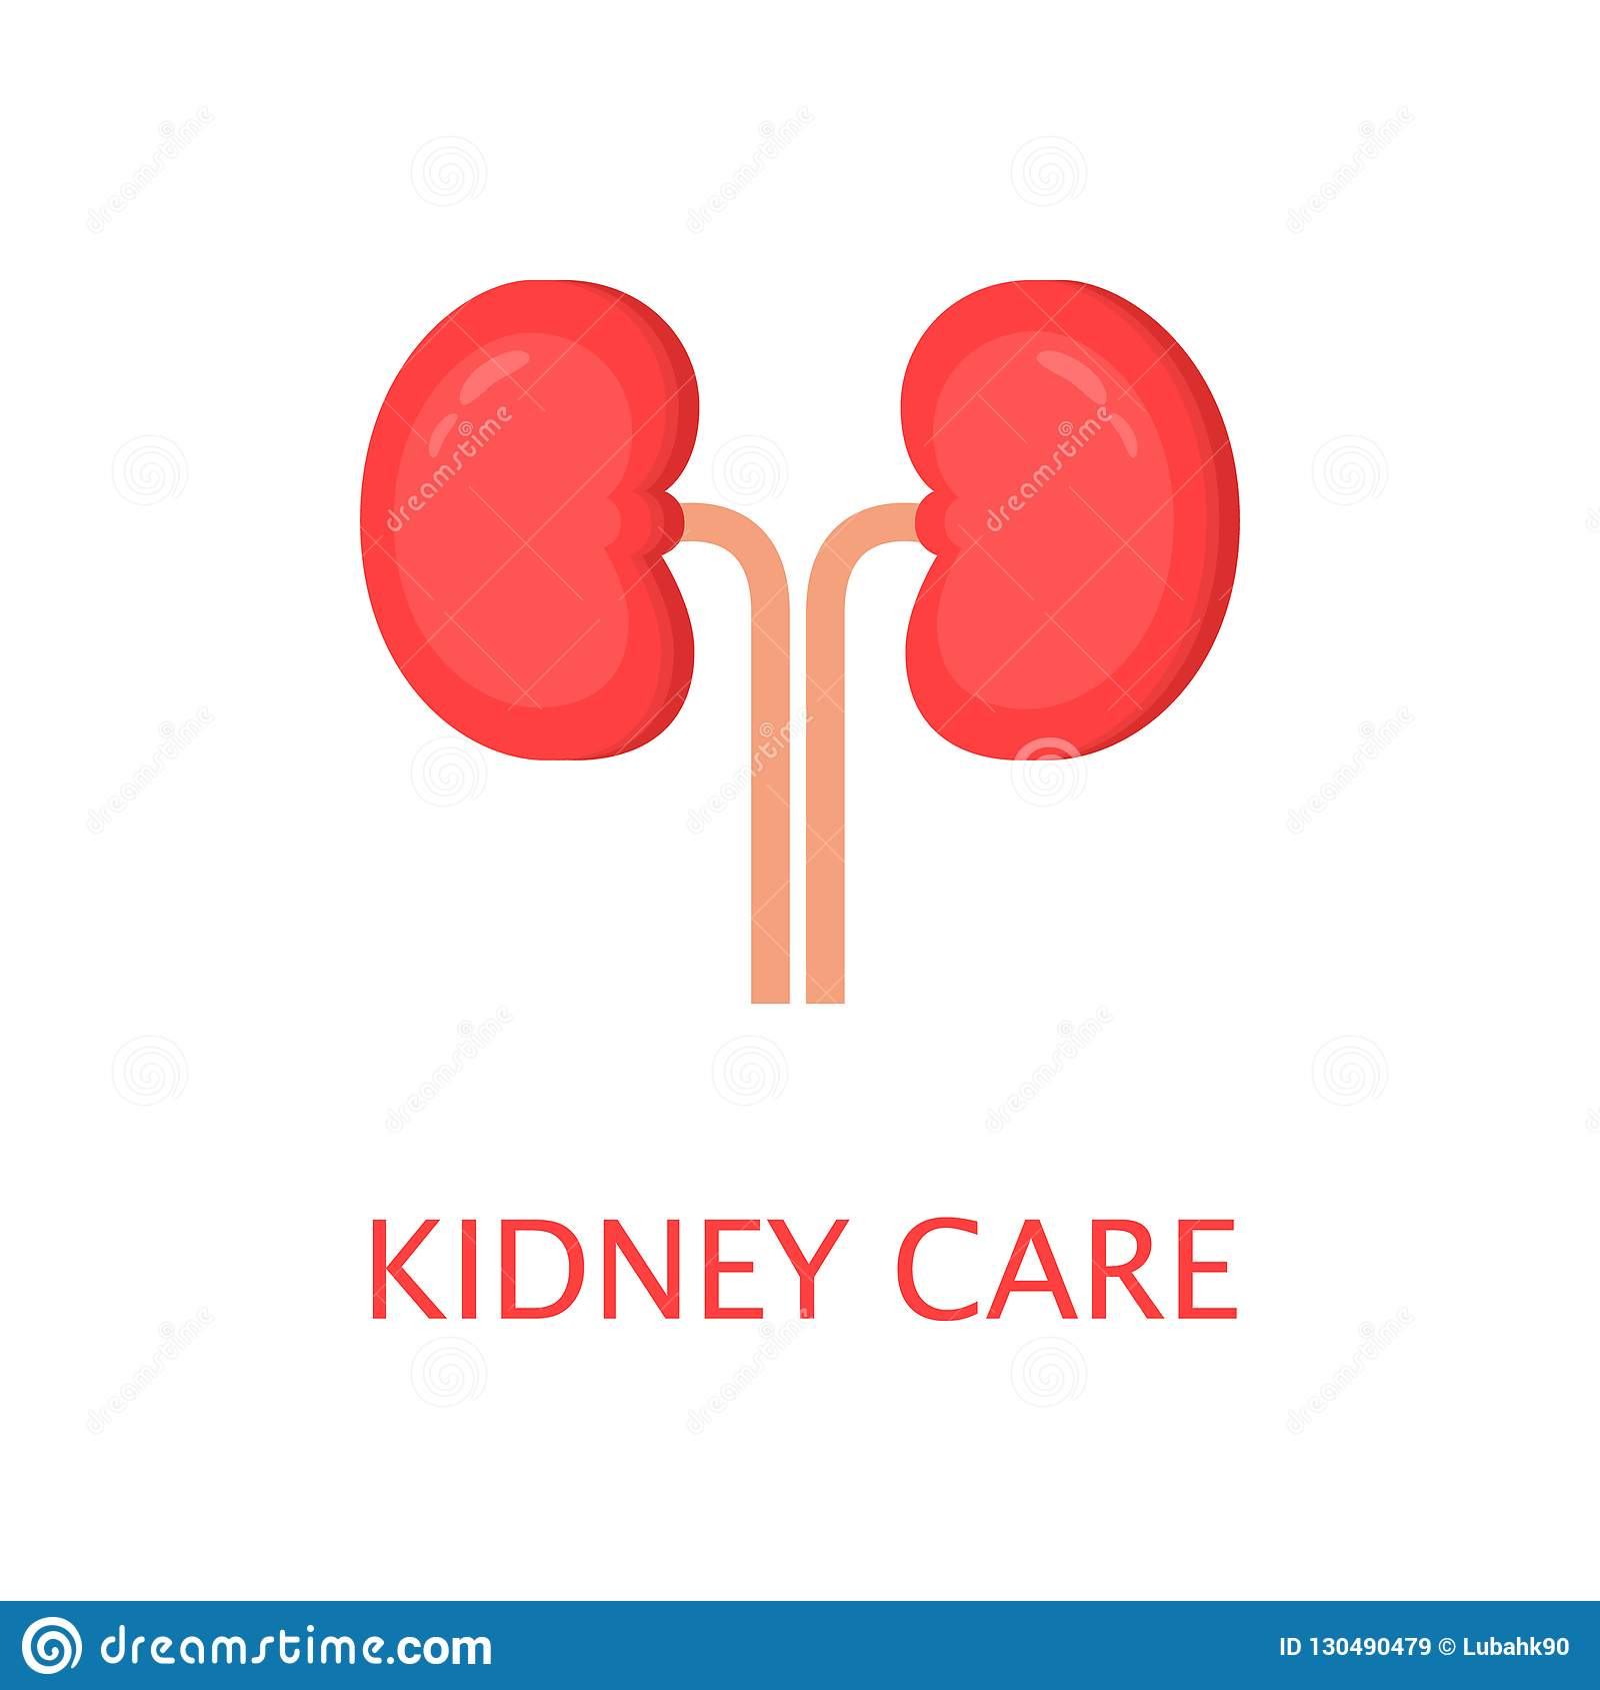 Healthy Kidneys In Flat Style Left And Right Kidney Human Internal Organ Anatomy Concept World Kidney Day Cute Cartoon Vector Stock Vector Illustration Of Happy Bean 130490479